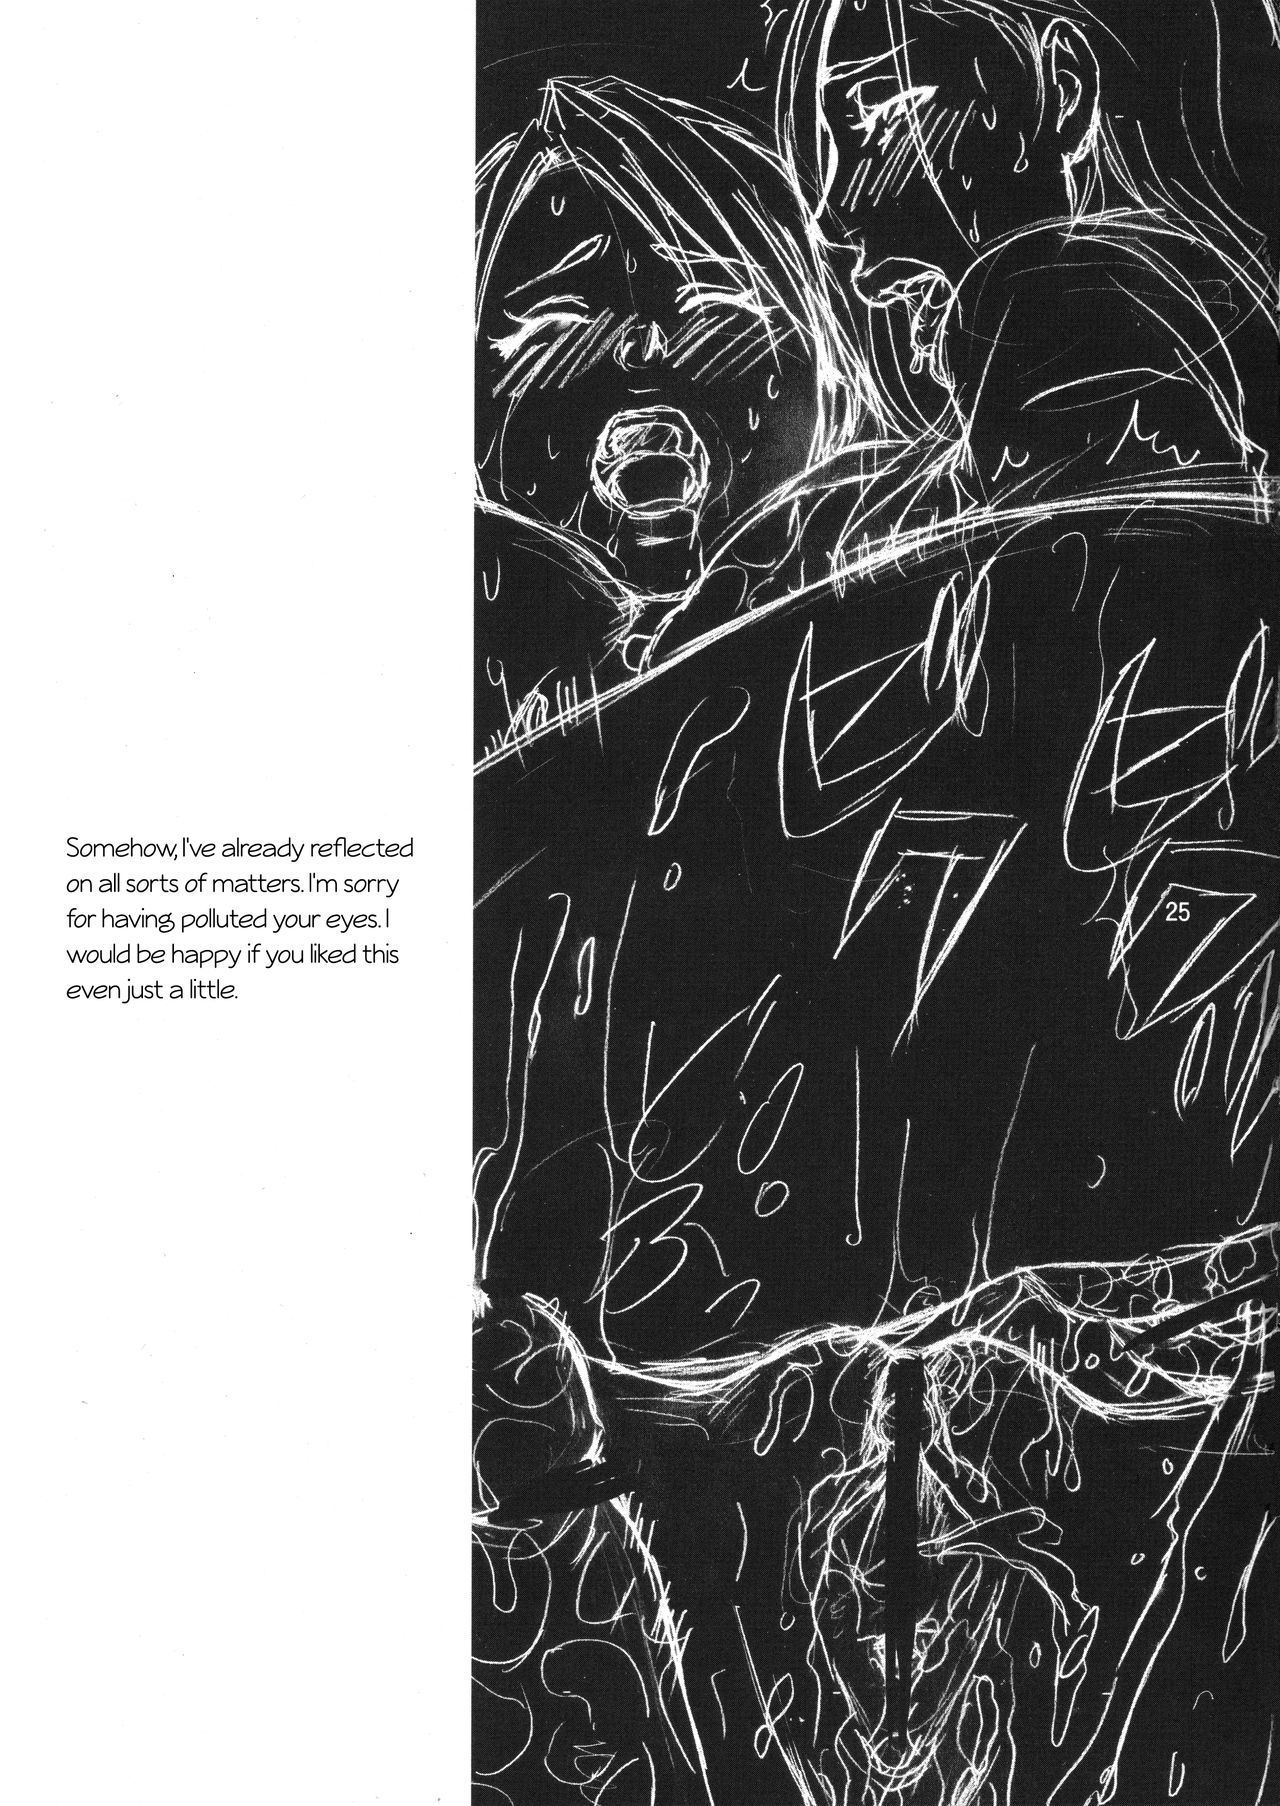 (C74) R55 Kyouwakoku (Kuroya Kenji) SOIX 3 (Fullmetal Alchemist) KirbyDances Colorized Decensored - part 2